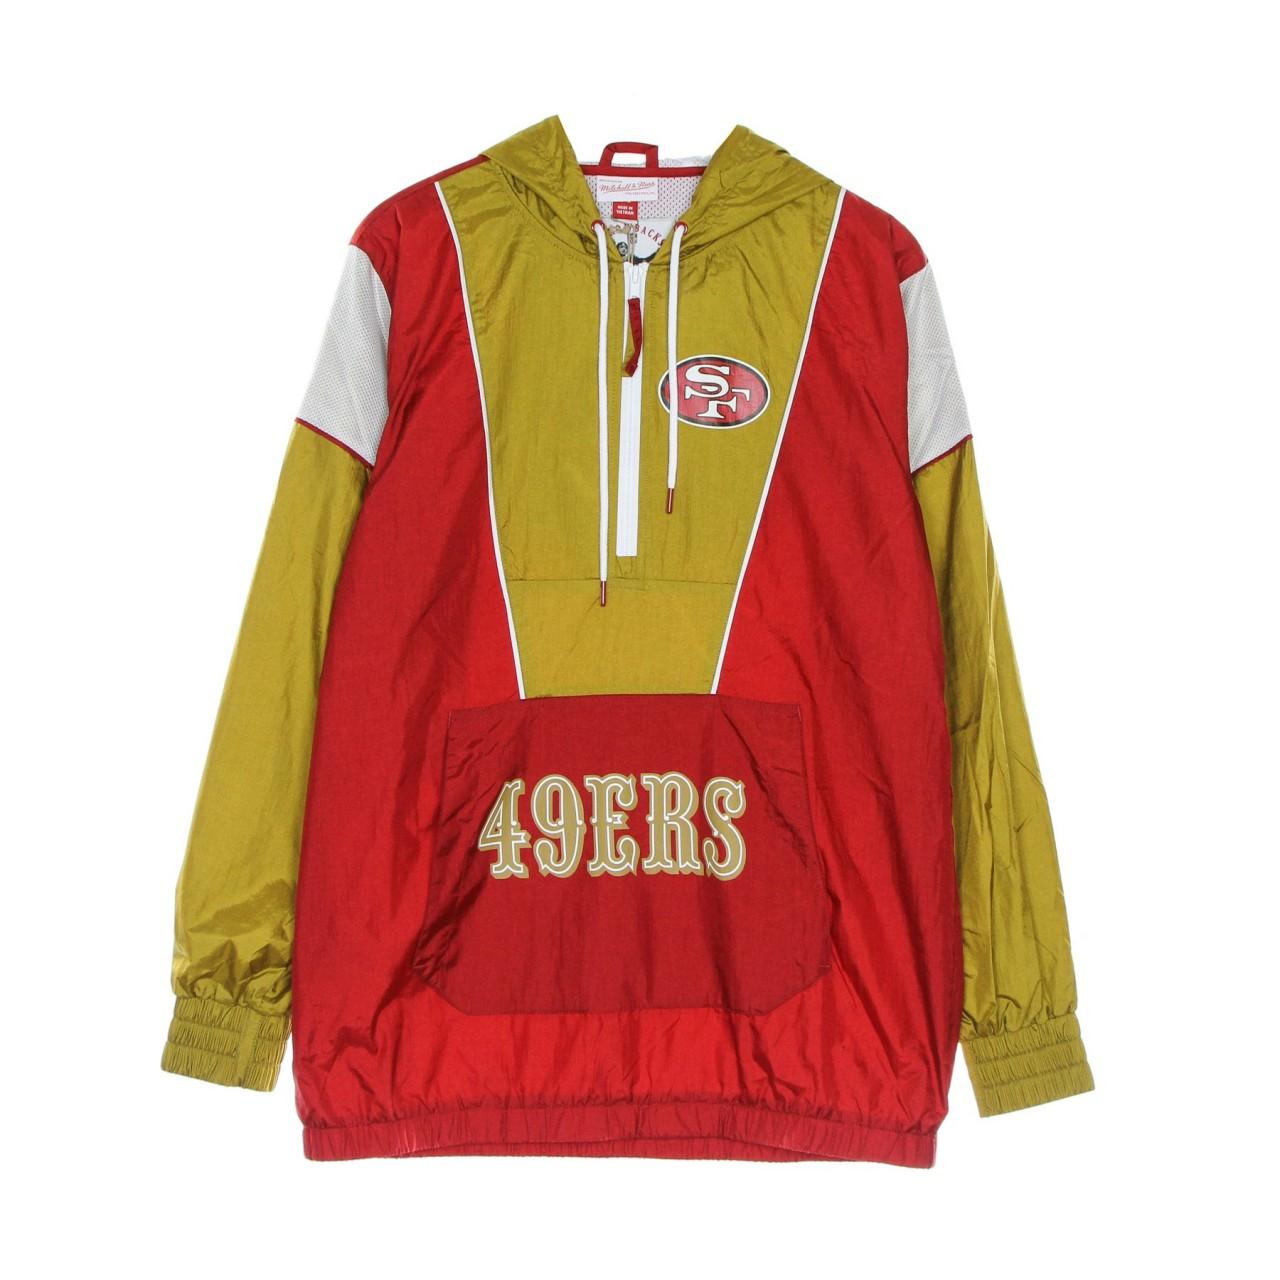 MITCHELL & NESS NFL HIGHLIGHT REEL WINDBREAKER SAF49E OJPO1038-SF4YYPPPSCAR